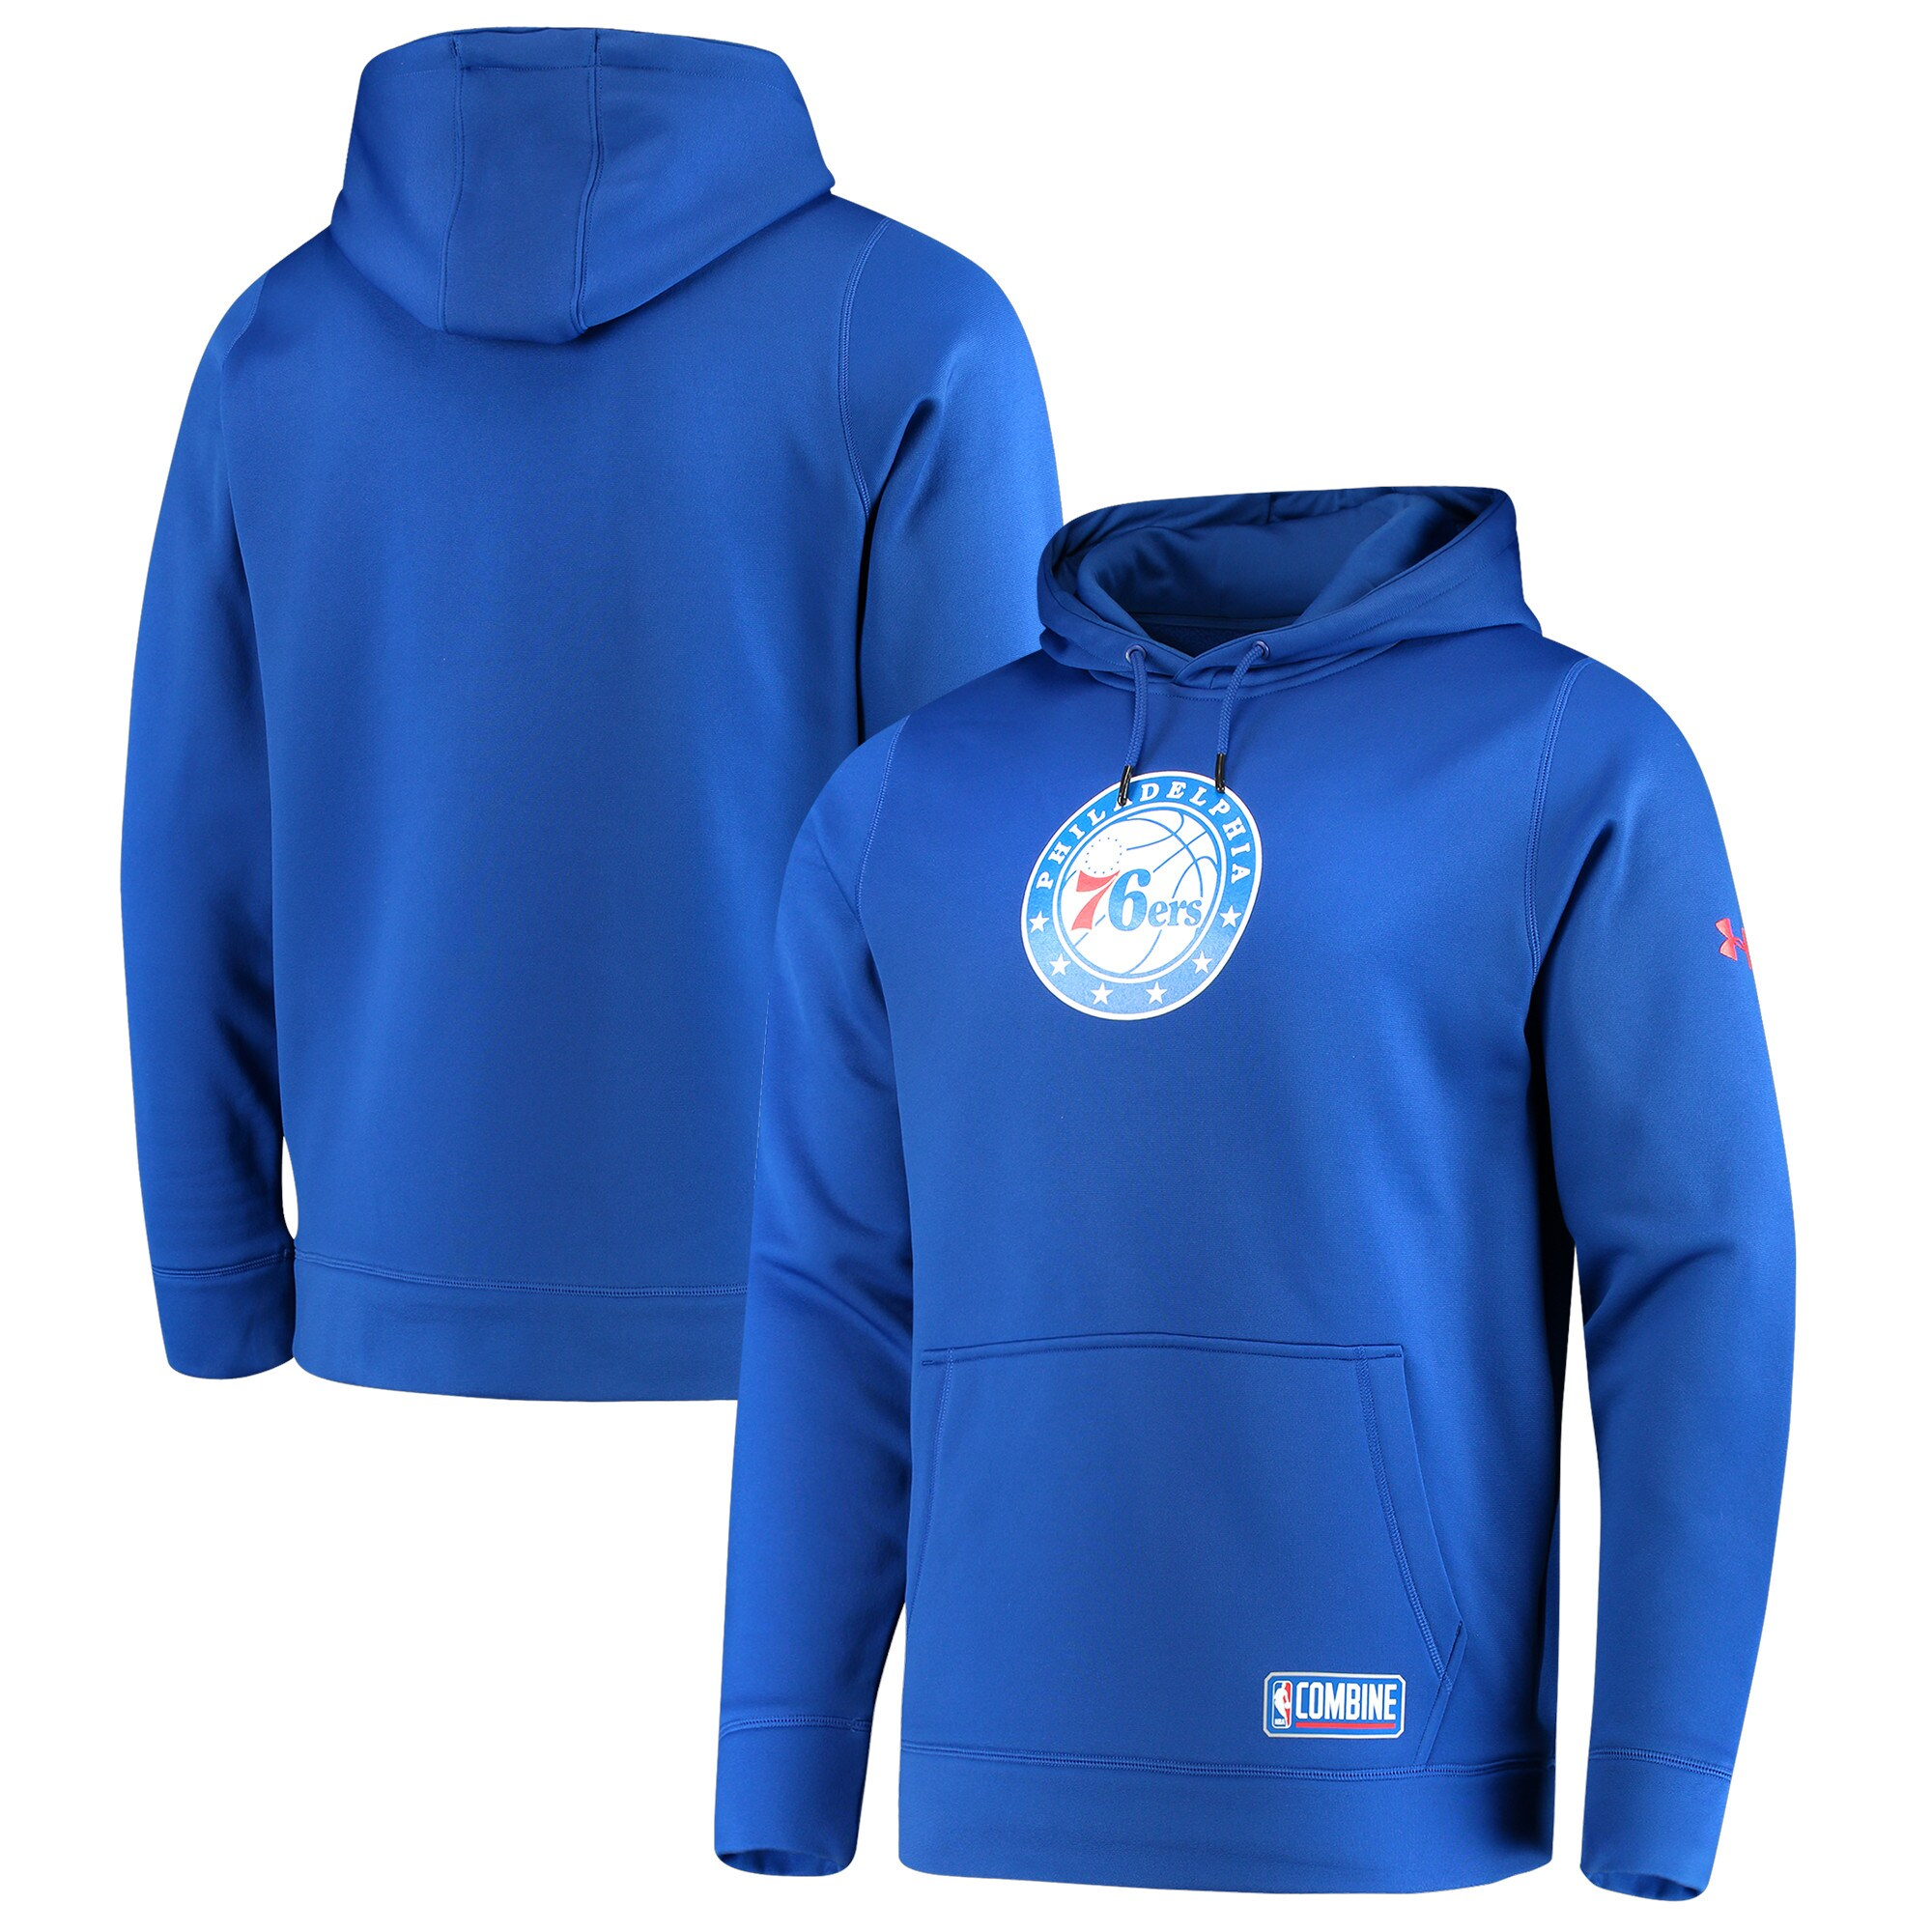 Philadelphia 76ers Under Armour Team Logo Performance Fleece Pullover Hoodie - Royal